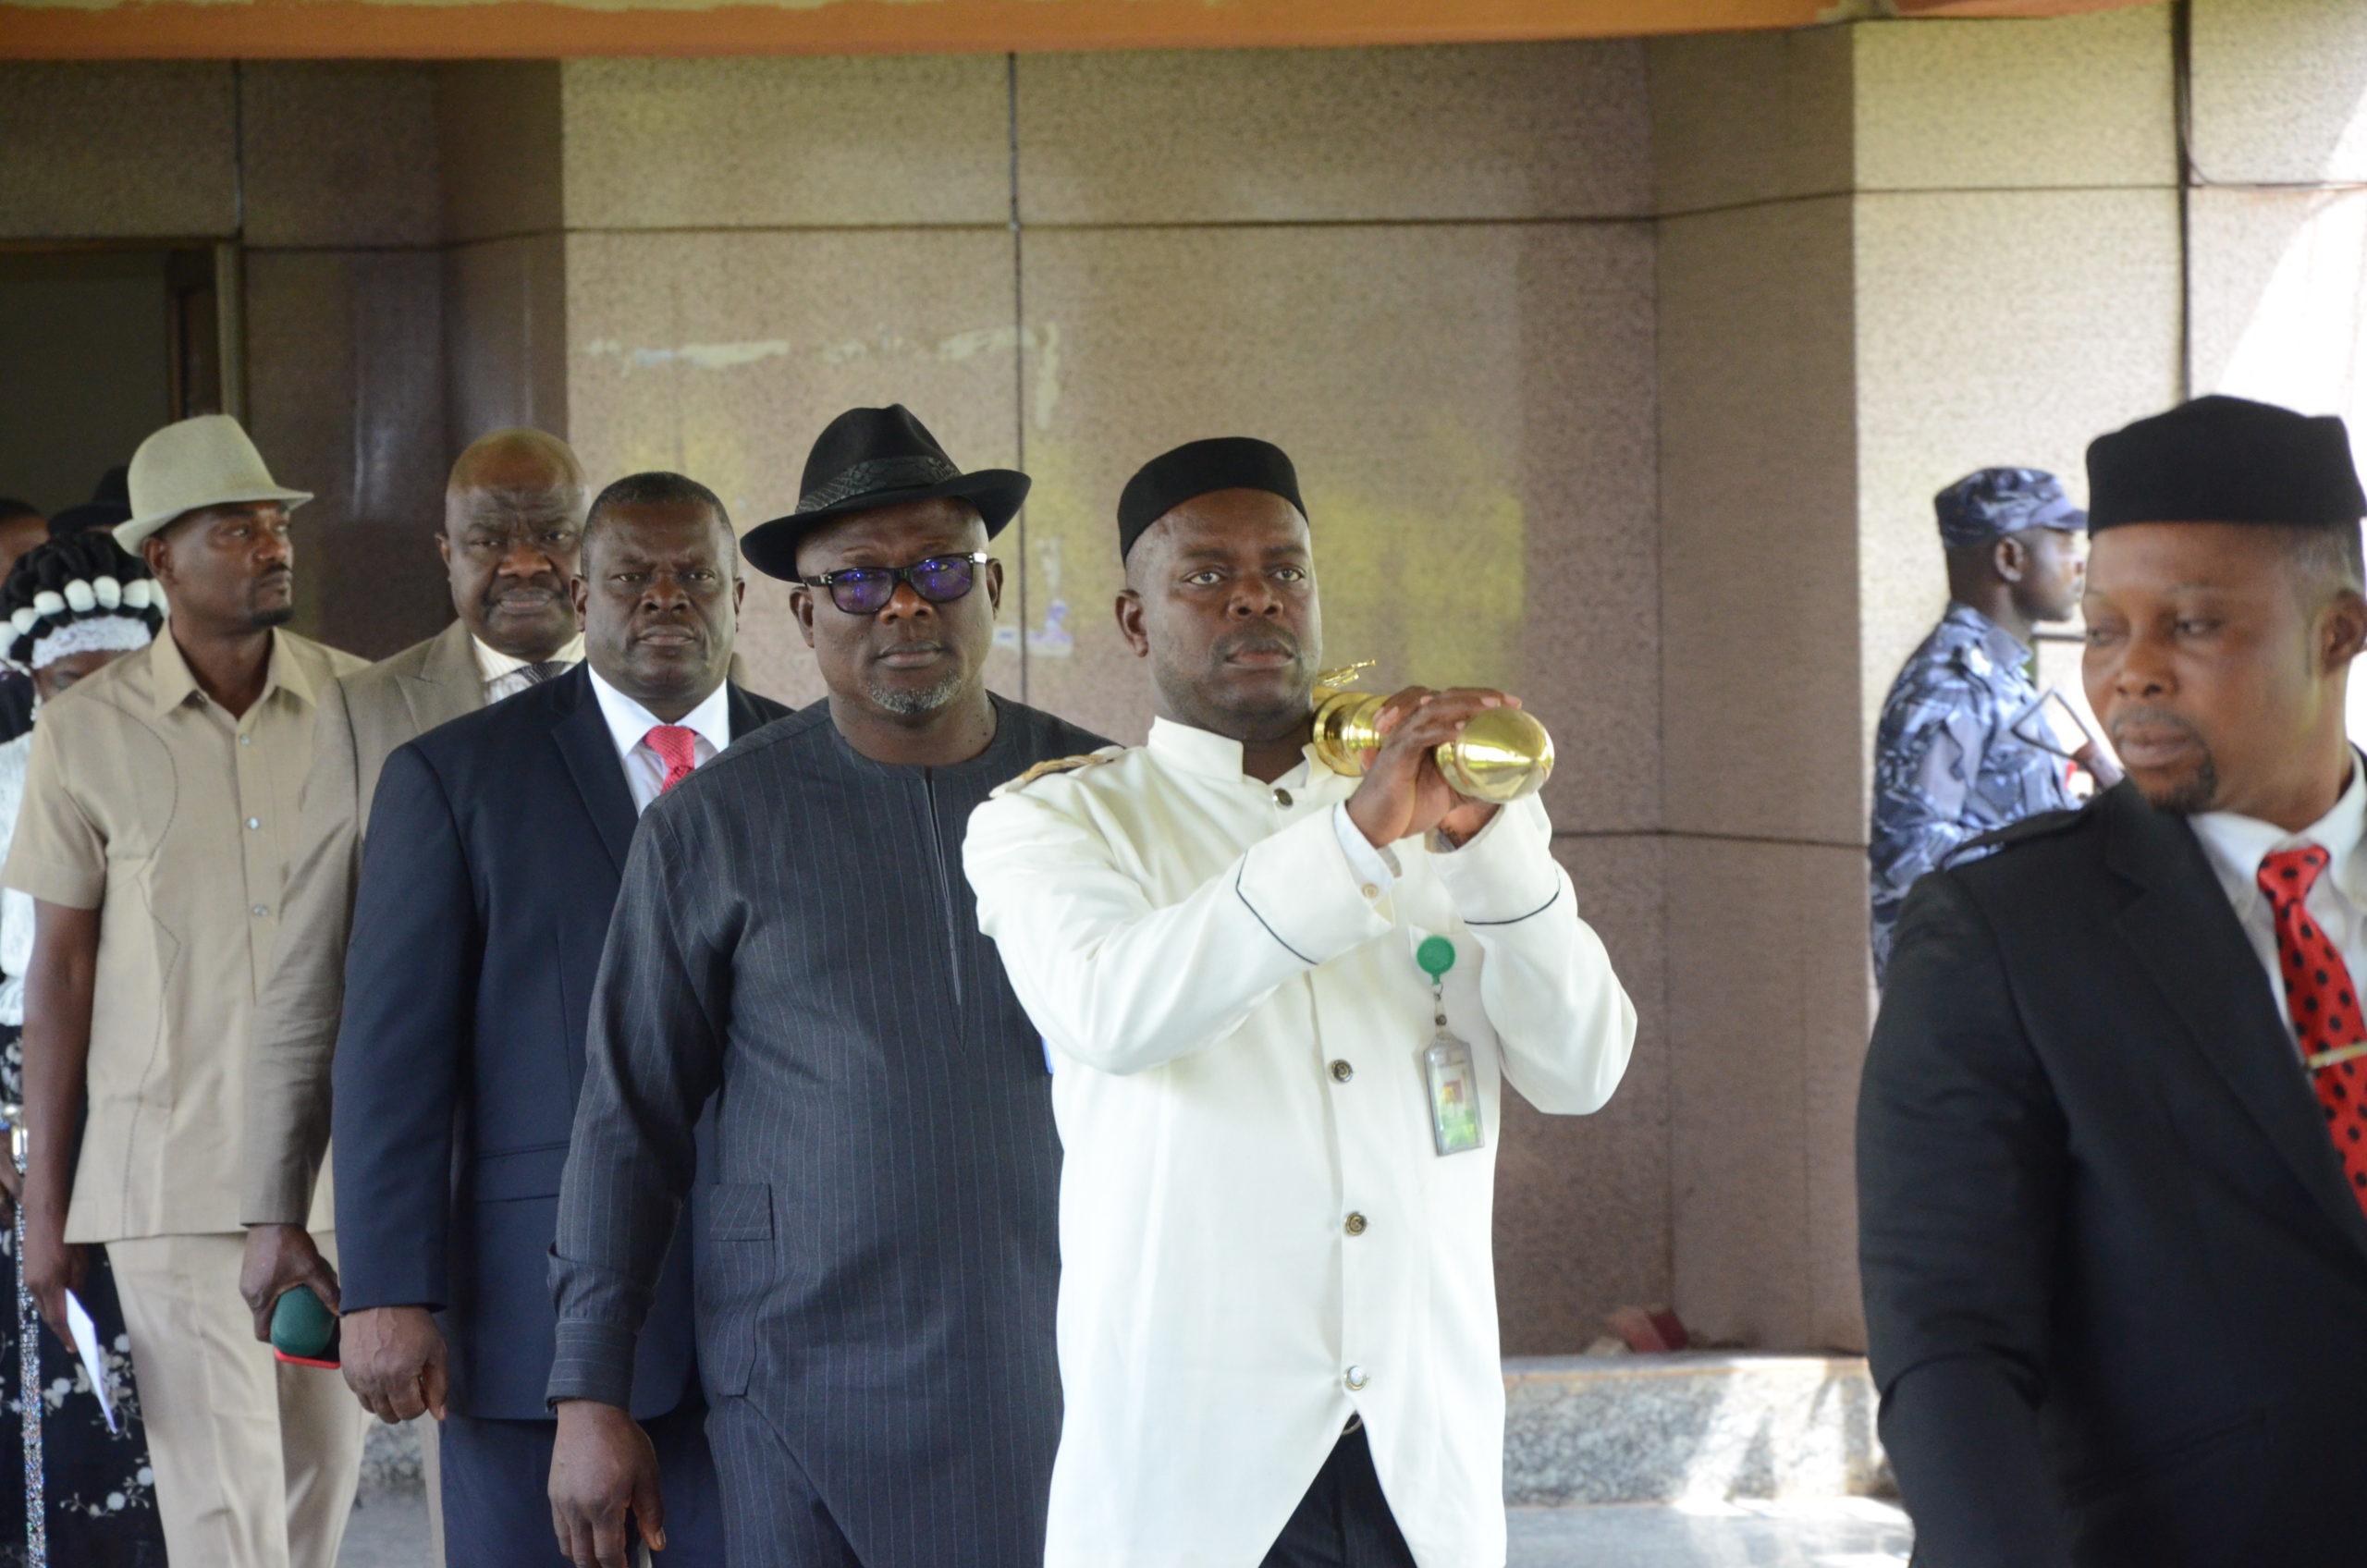 NNN: 三角洲州长Ifeanyi Okowa博士说,建成的Asaba电影村和休闲公园将促进该州的经济发展,并 […]